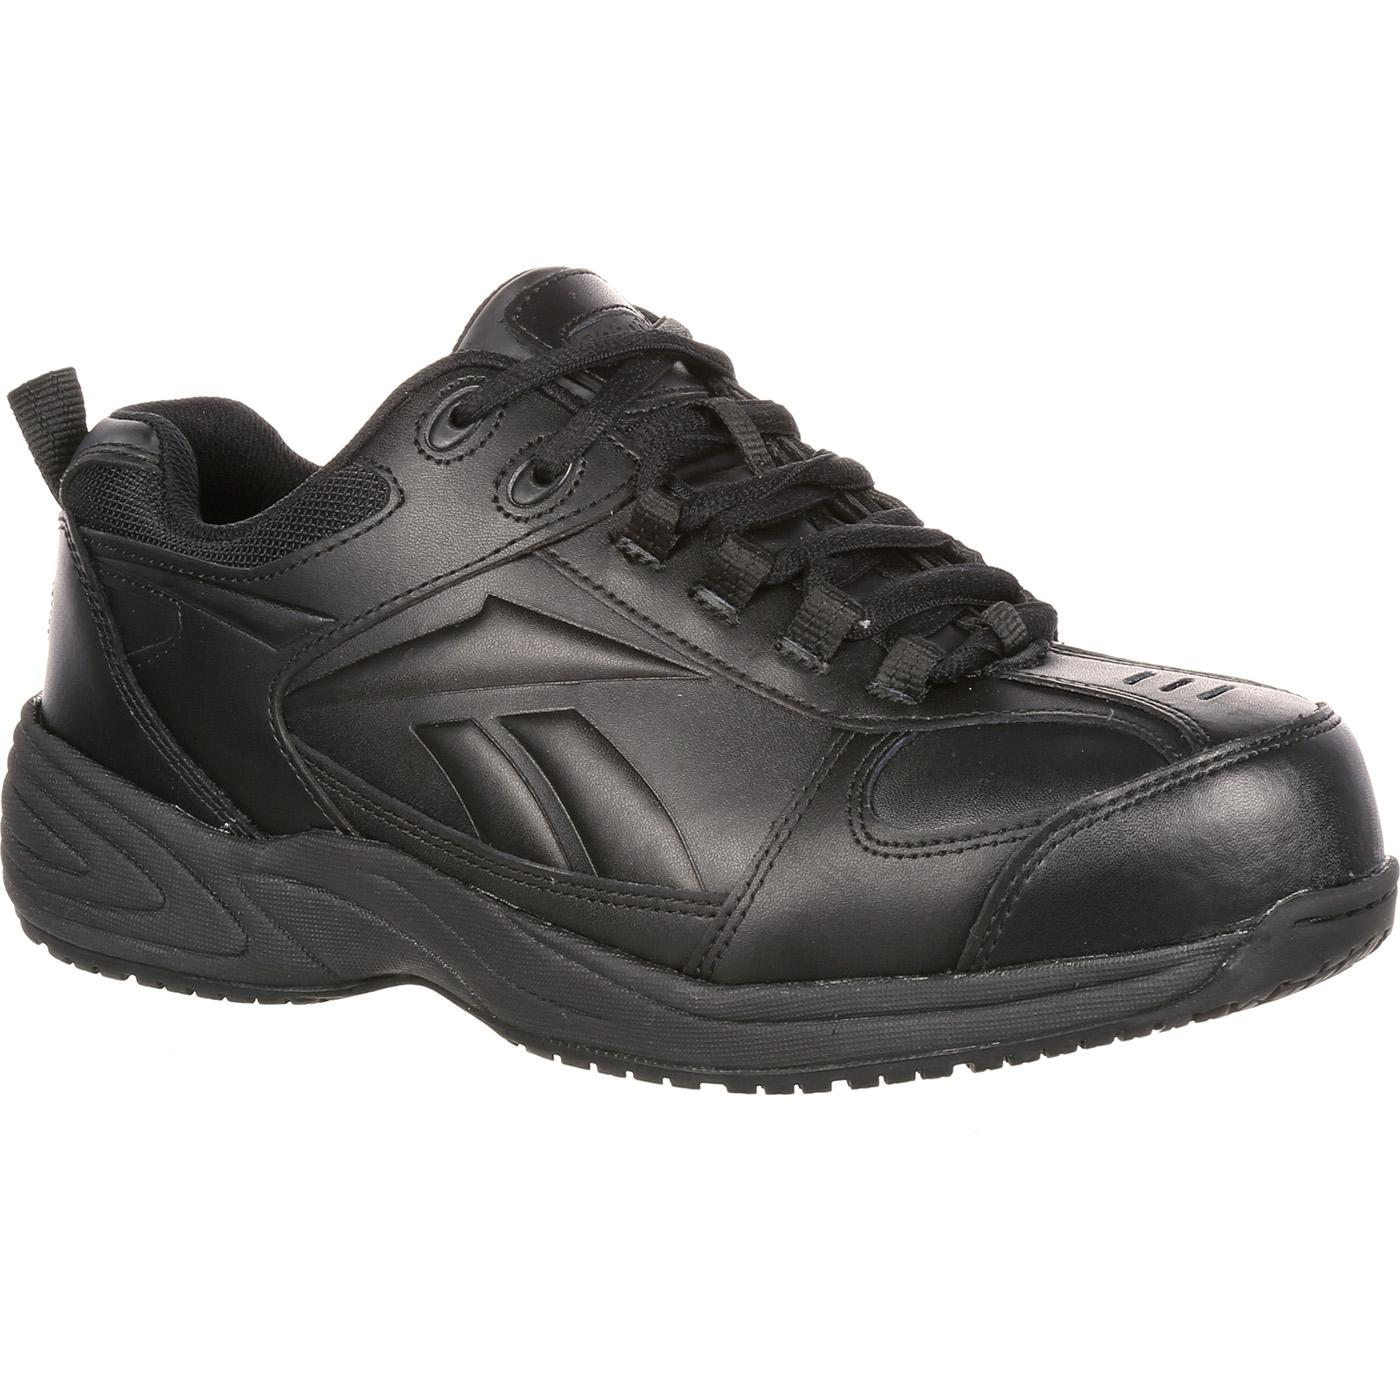 7074d57d89b263 Reebok Jorie Composite Toe Slip-Resistant Athletic Work ShoeReebok Jorie  Composite Toe Slip-Resistant Athletic Work Shoe